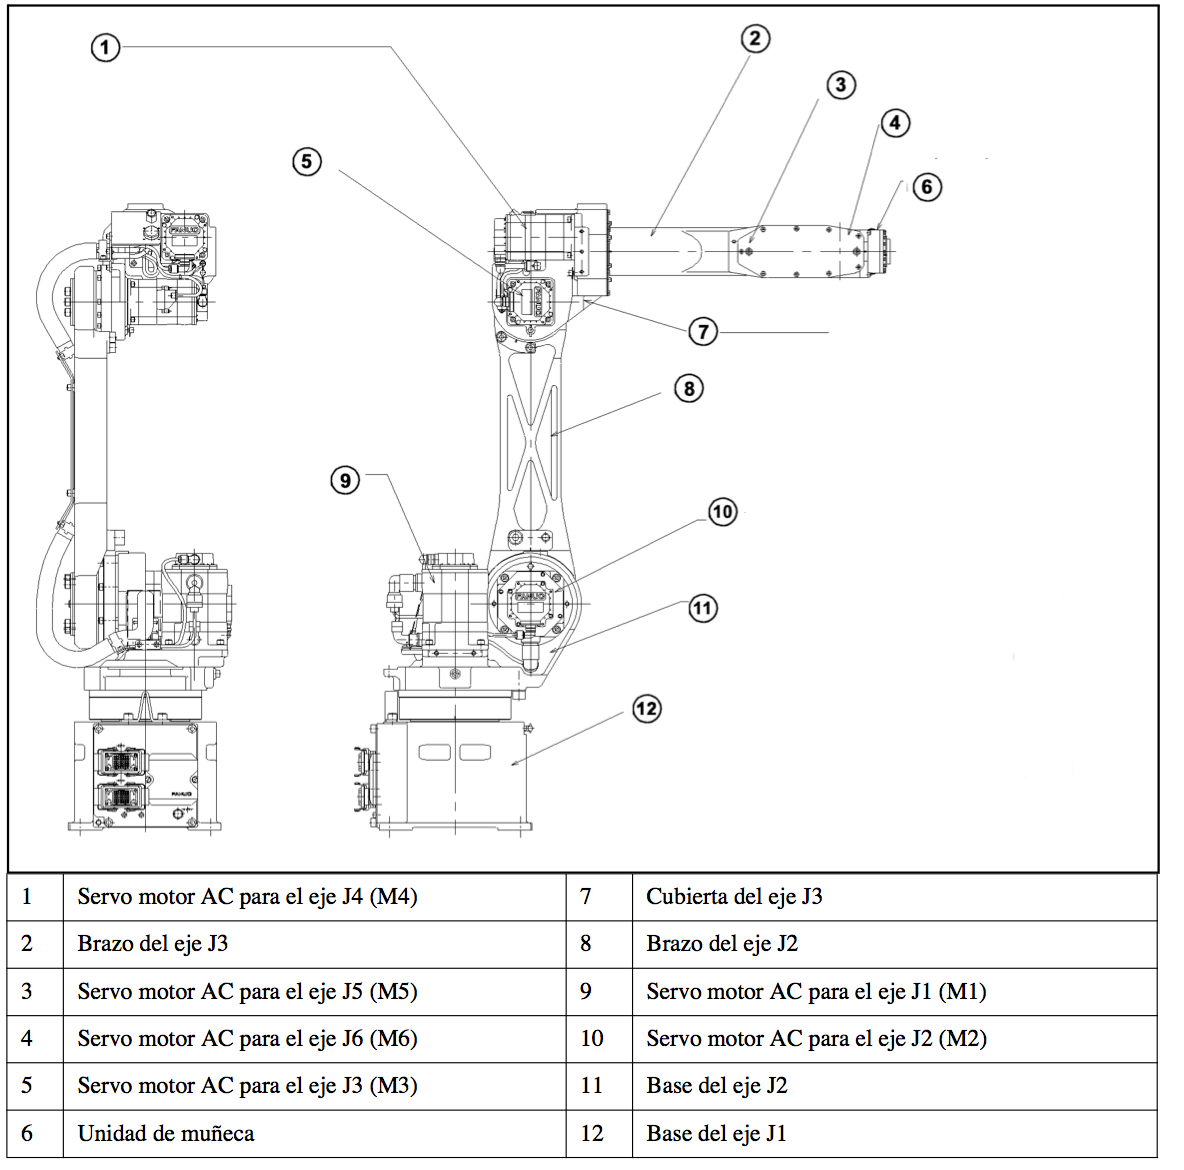 det_236_fanuc_robot_arc_mate_100ib fanuc refurbished arcmate 100ib eurobots fanuc motor wiring at bayanpartner.co